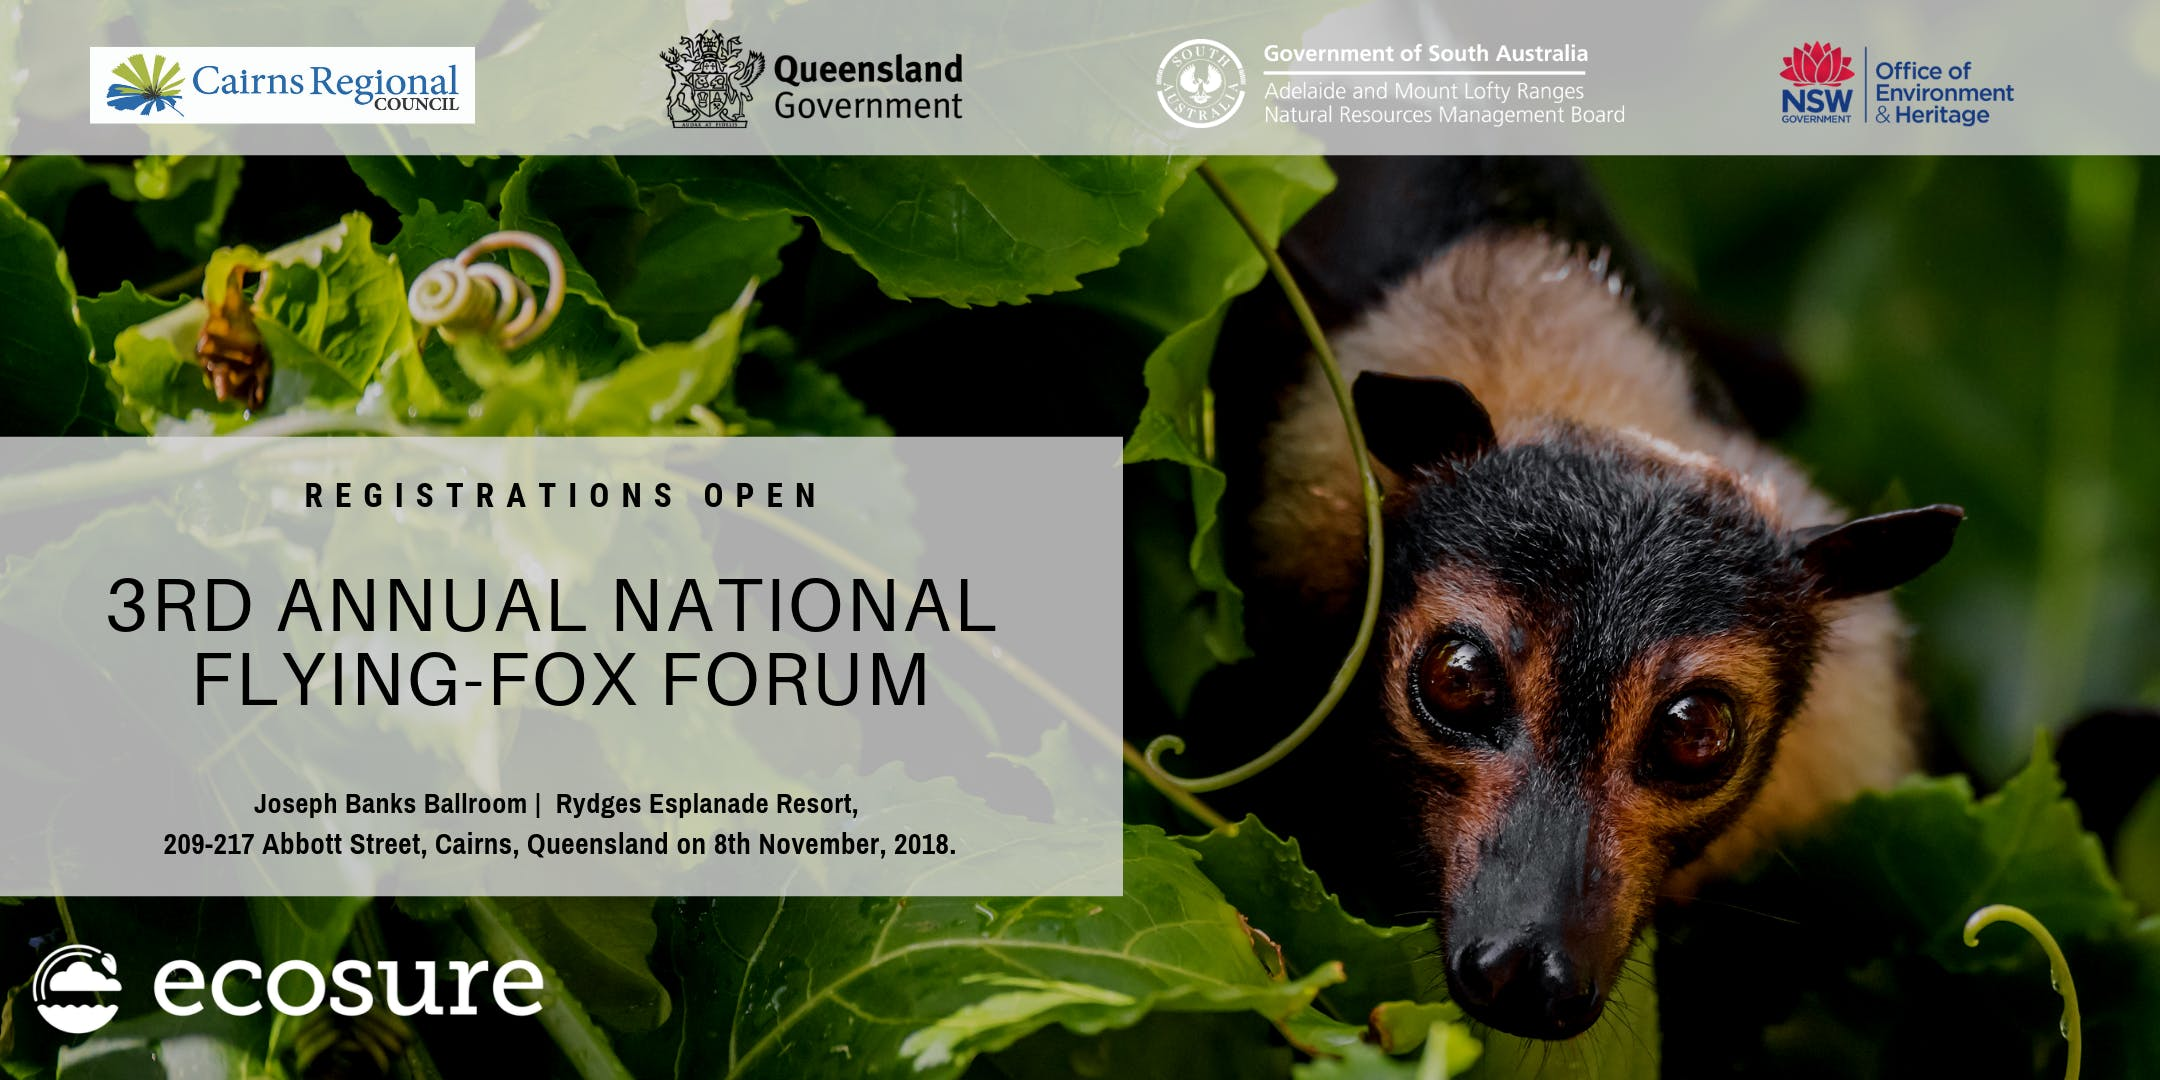 3rd Annual National Flying-Fox Forum